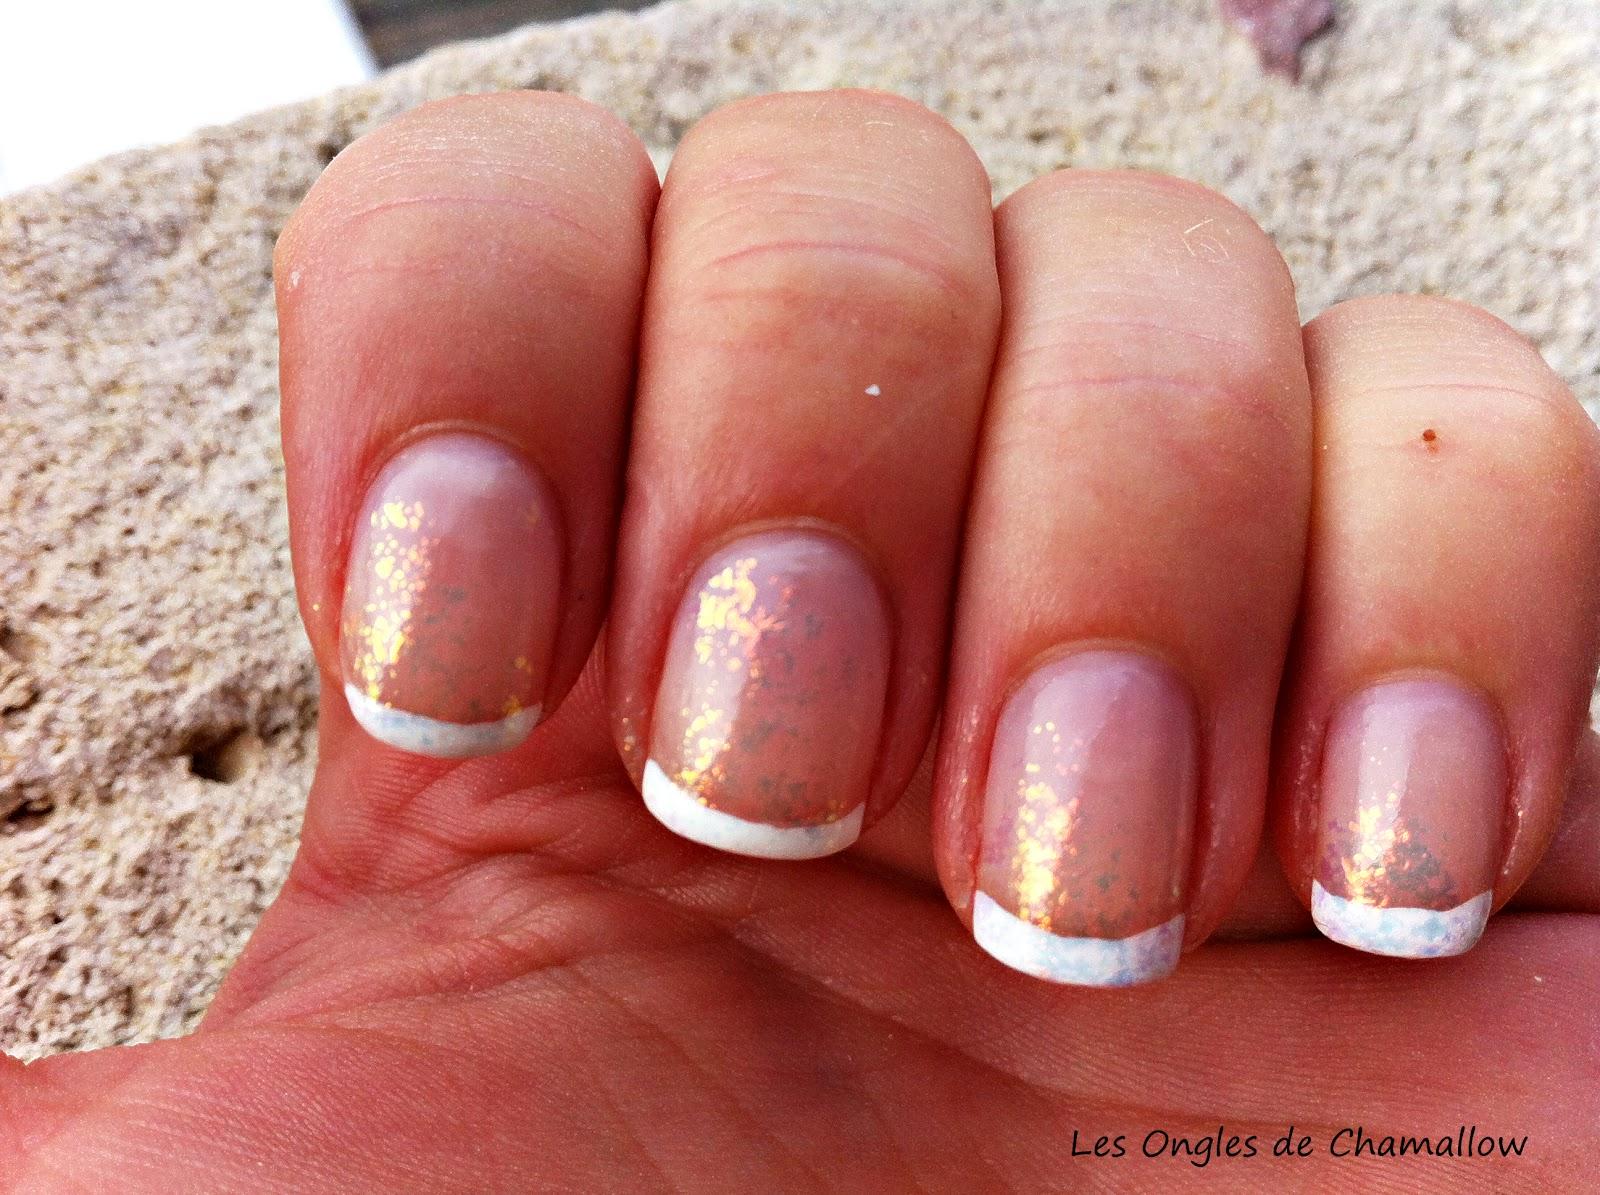 Les ongles de chamallow scintillante french manucure - Ongles french manucure photos ...